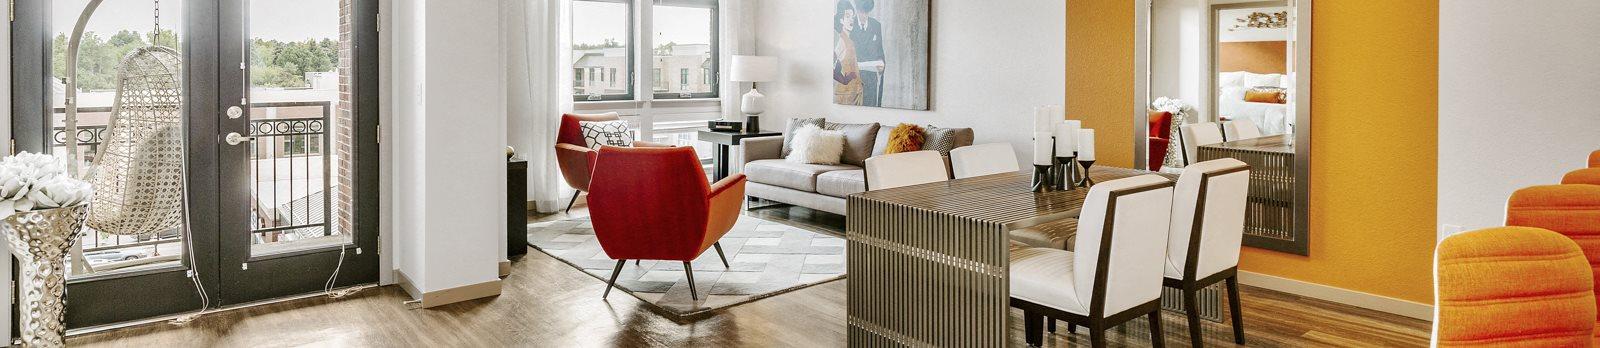 interior of apartment model living room